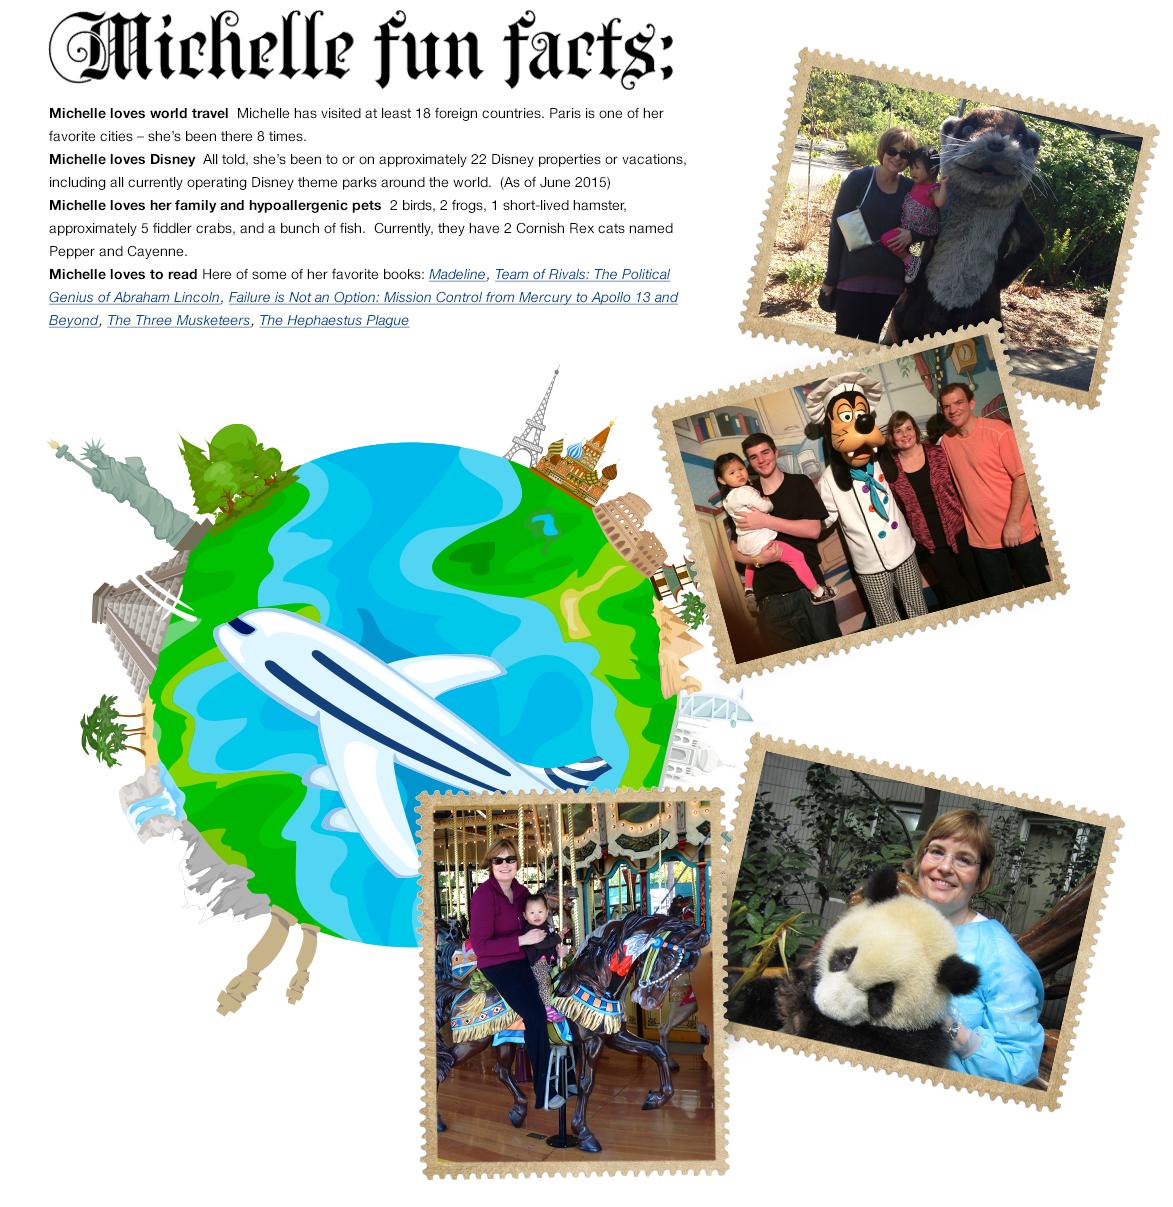 Michelle Wilson Fun Facts